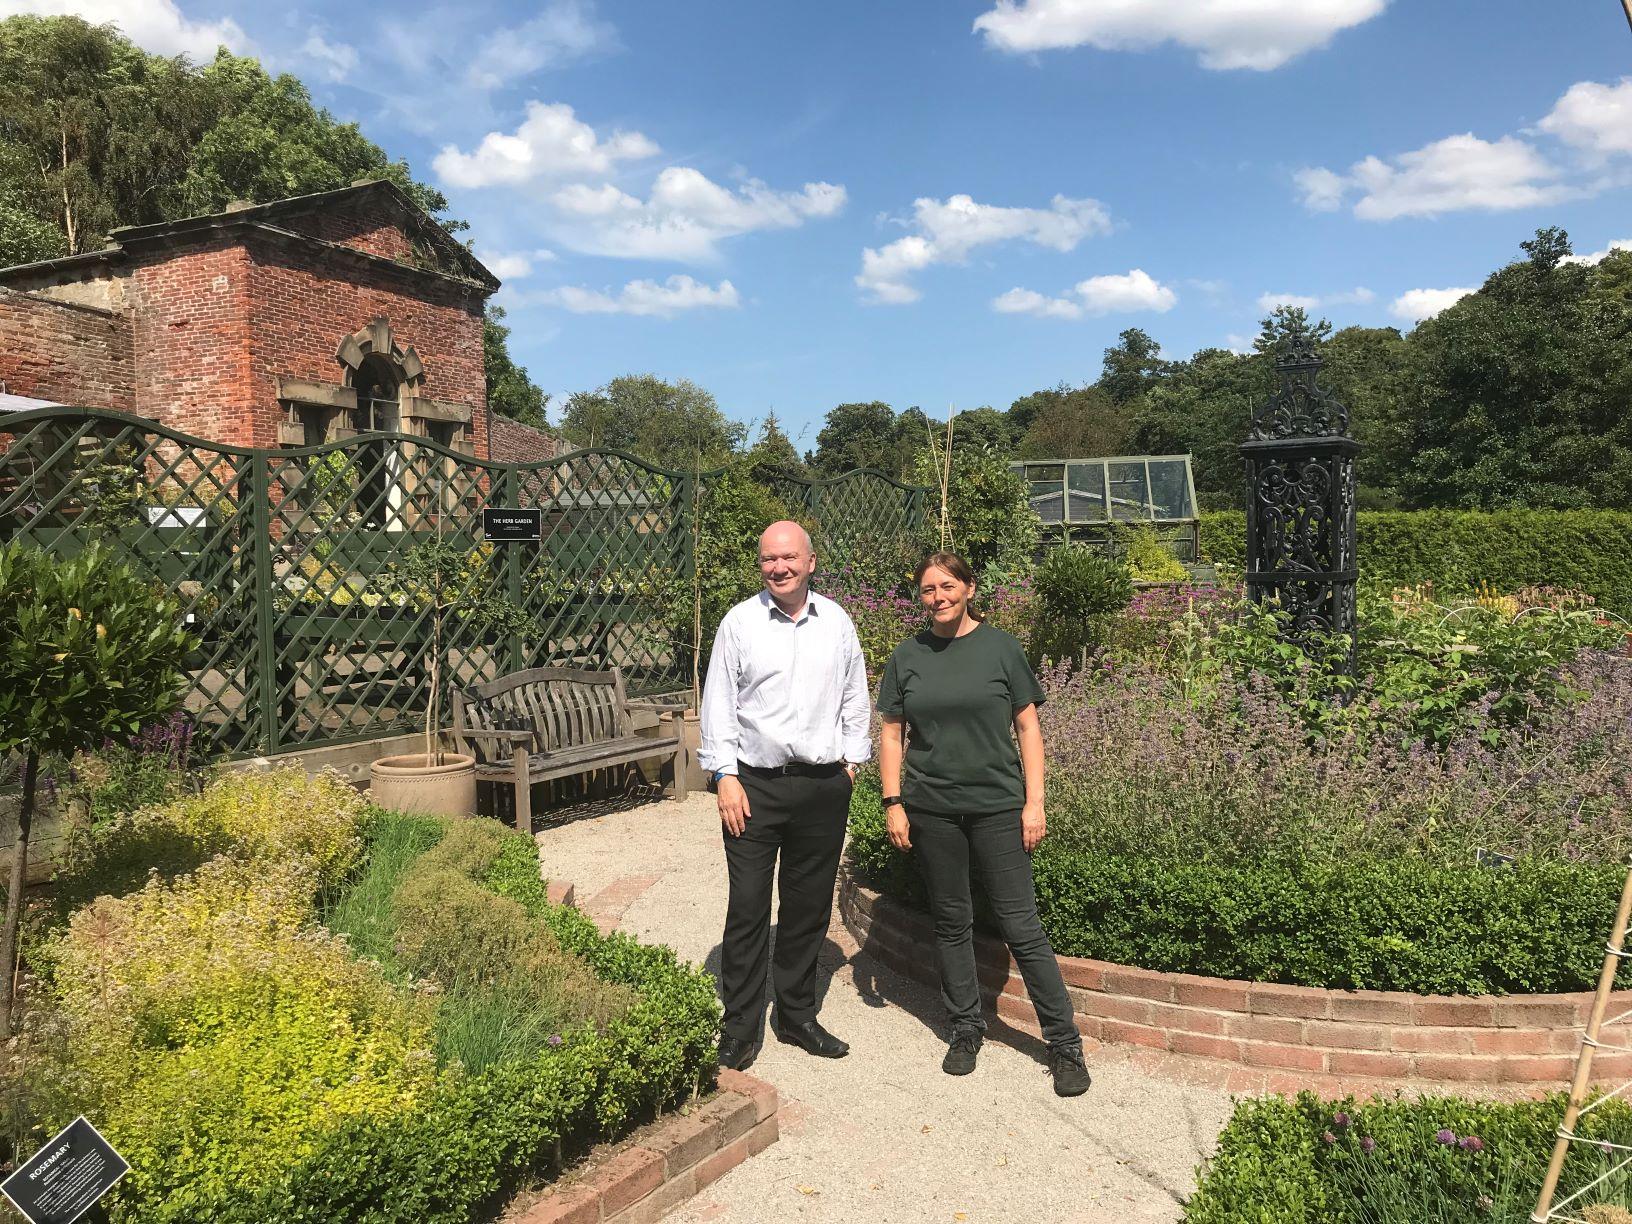 SAMH Redhall Walled Garden